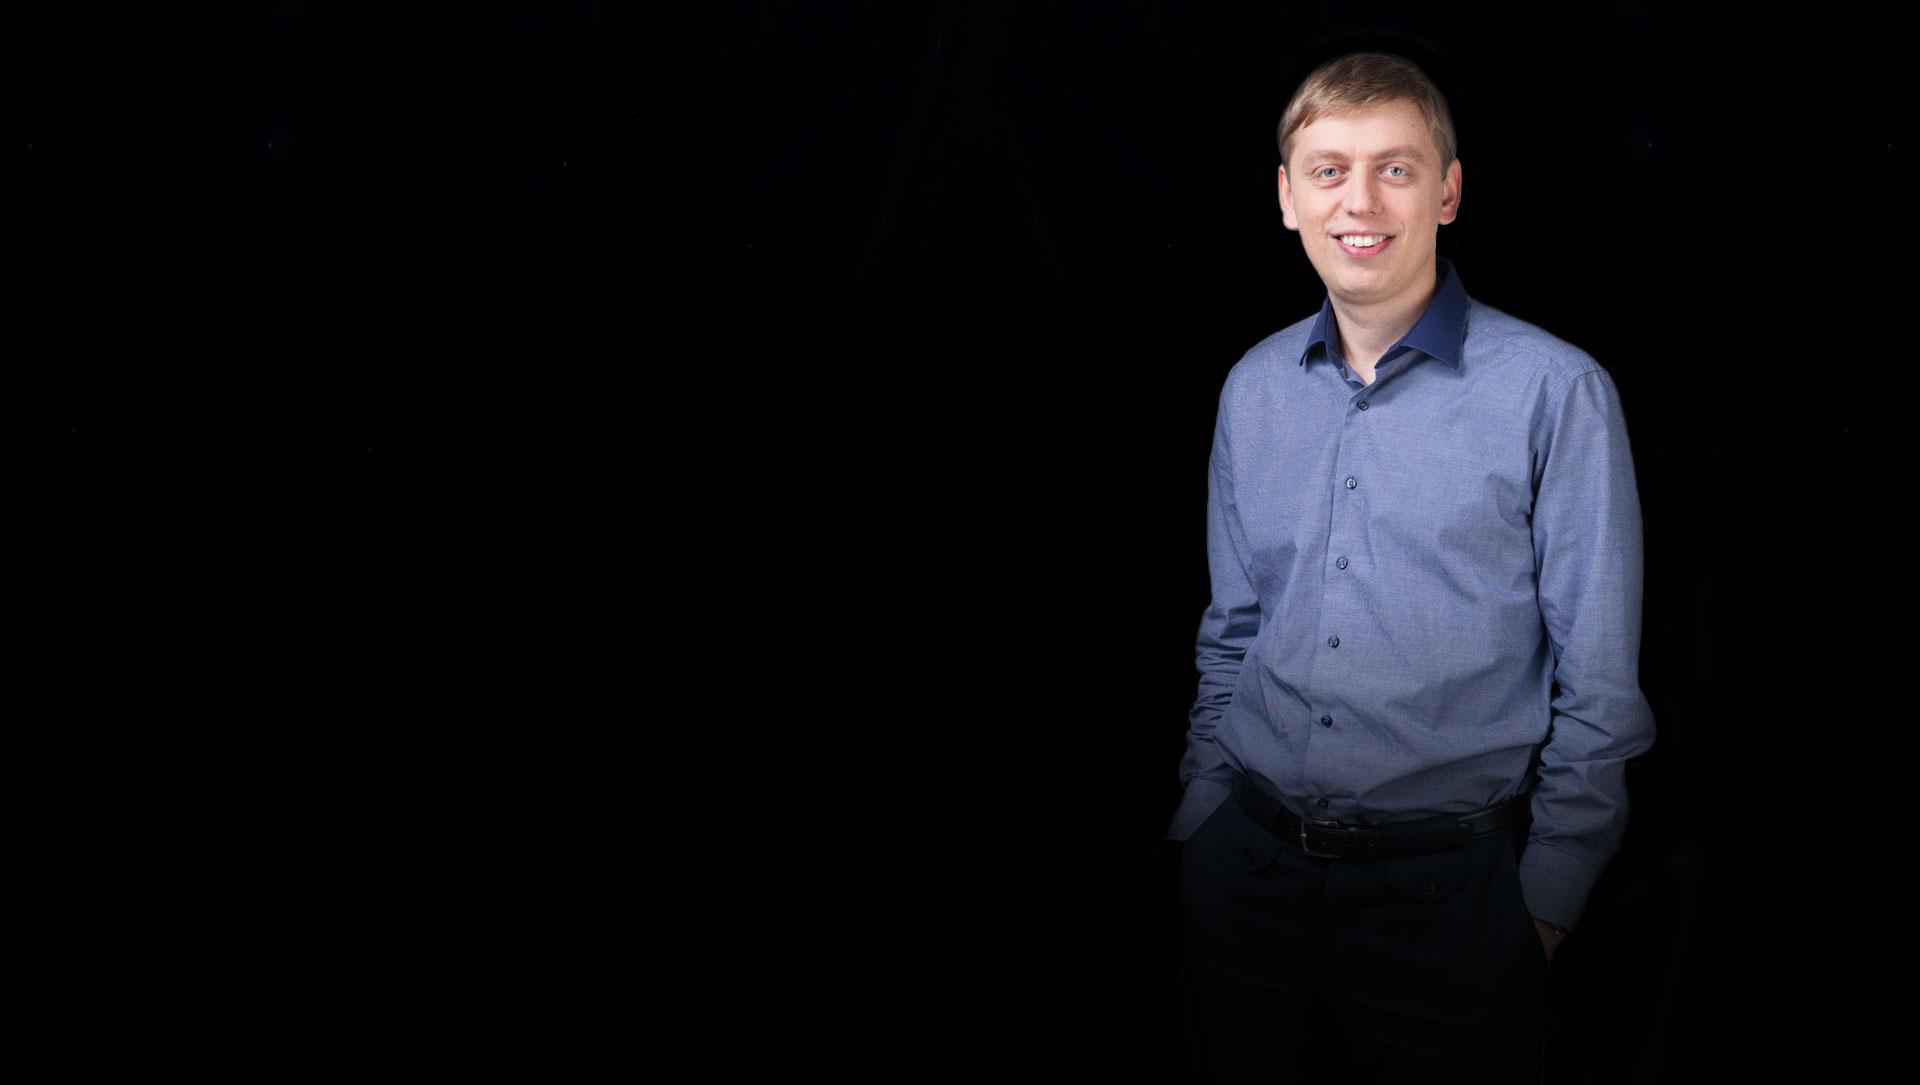 Леонид Савков, CMO «МегаФона»